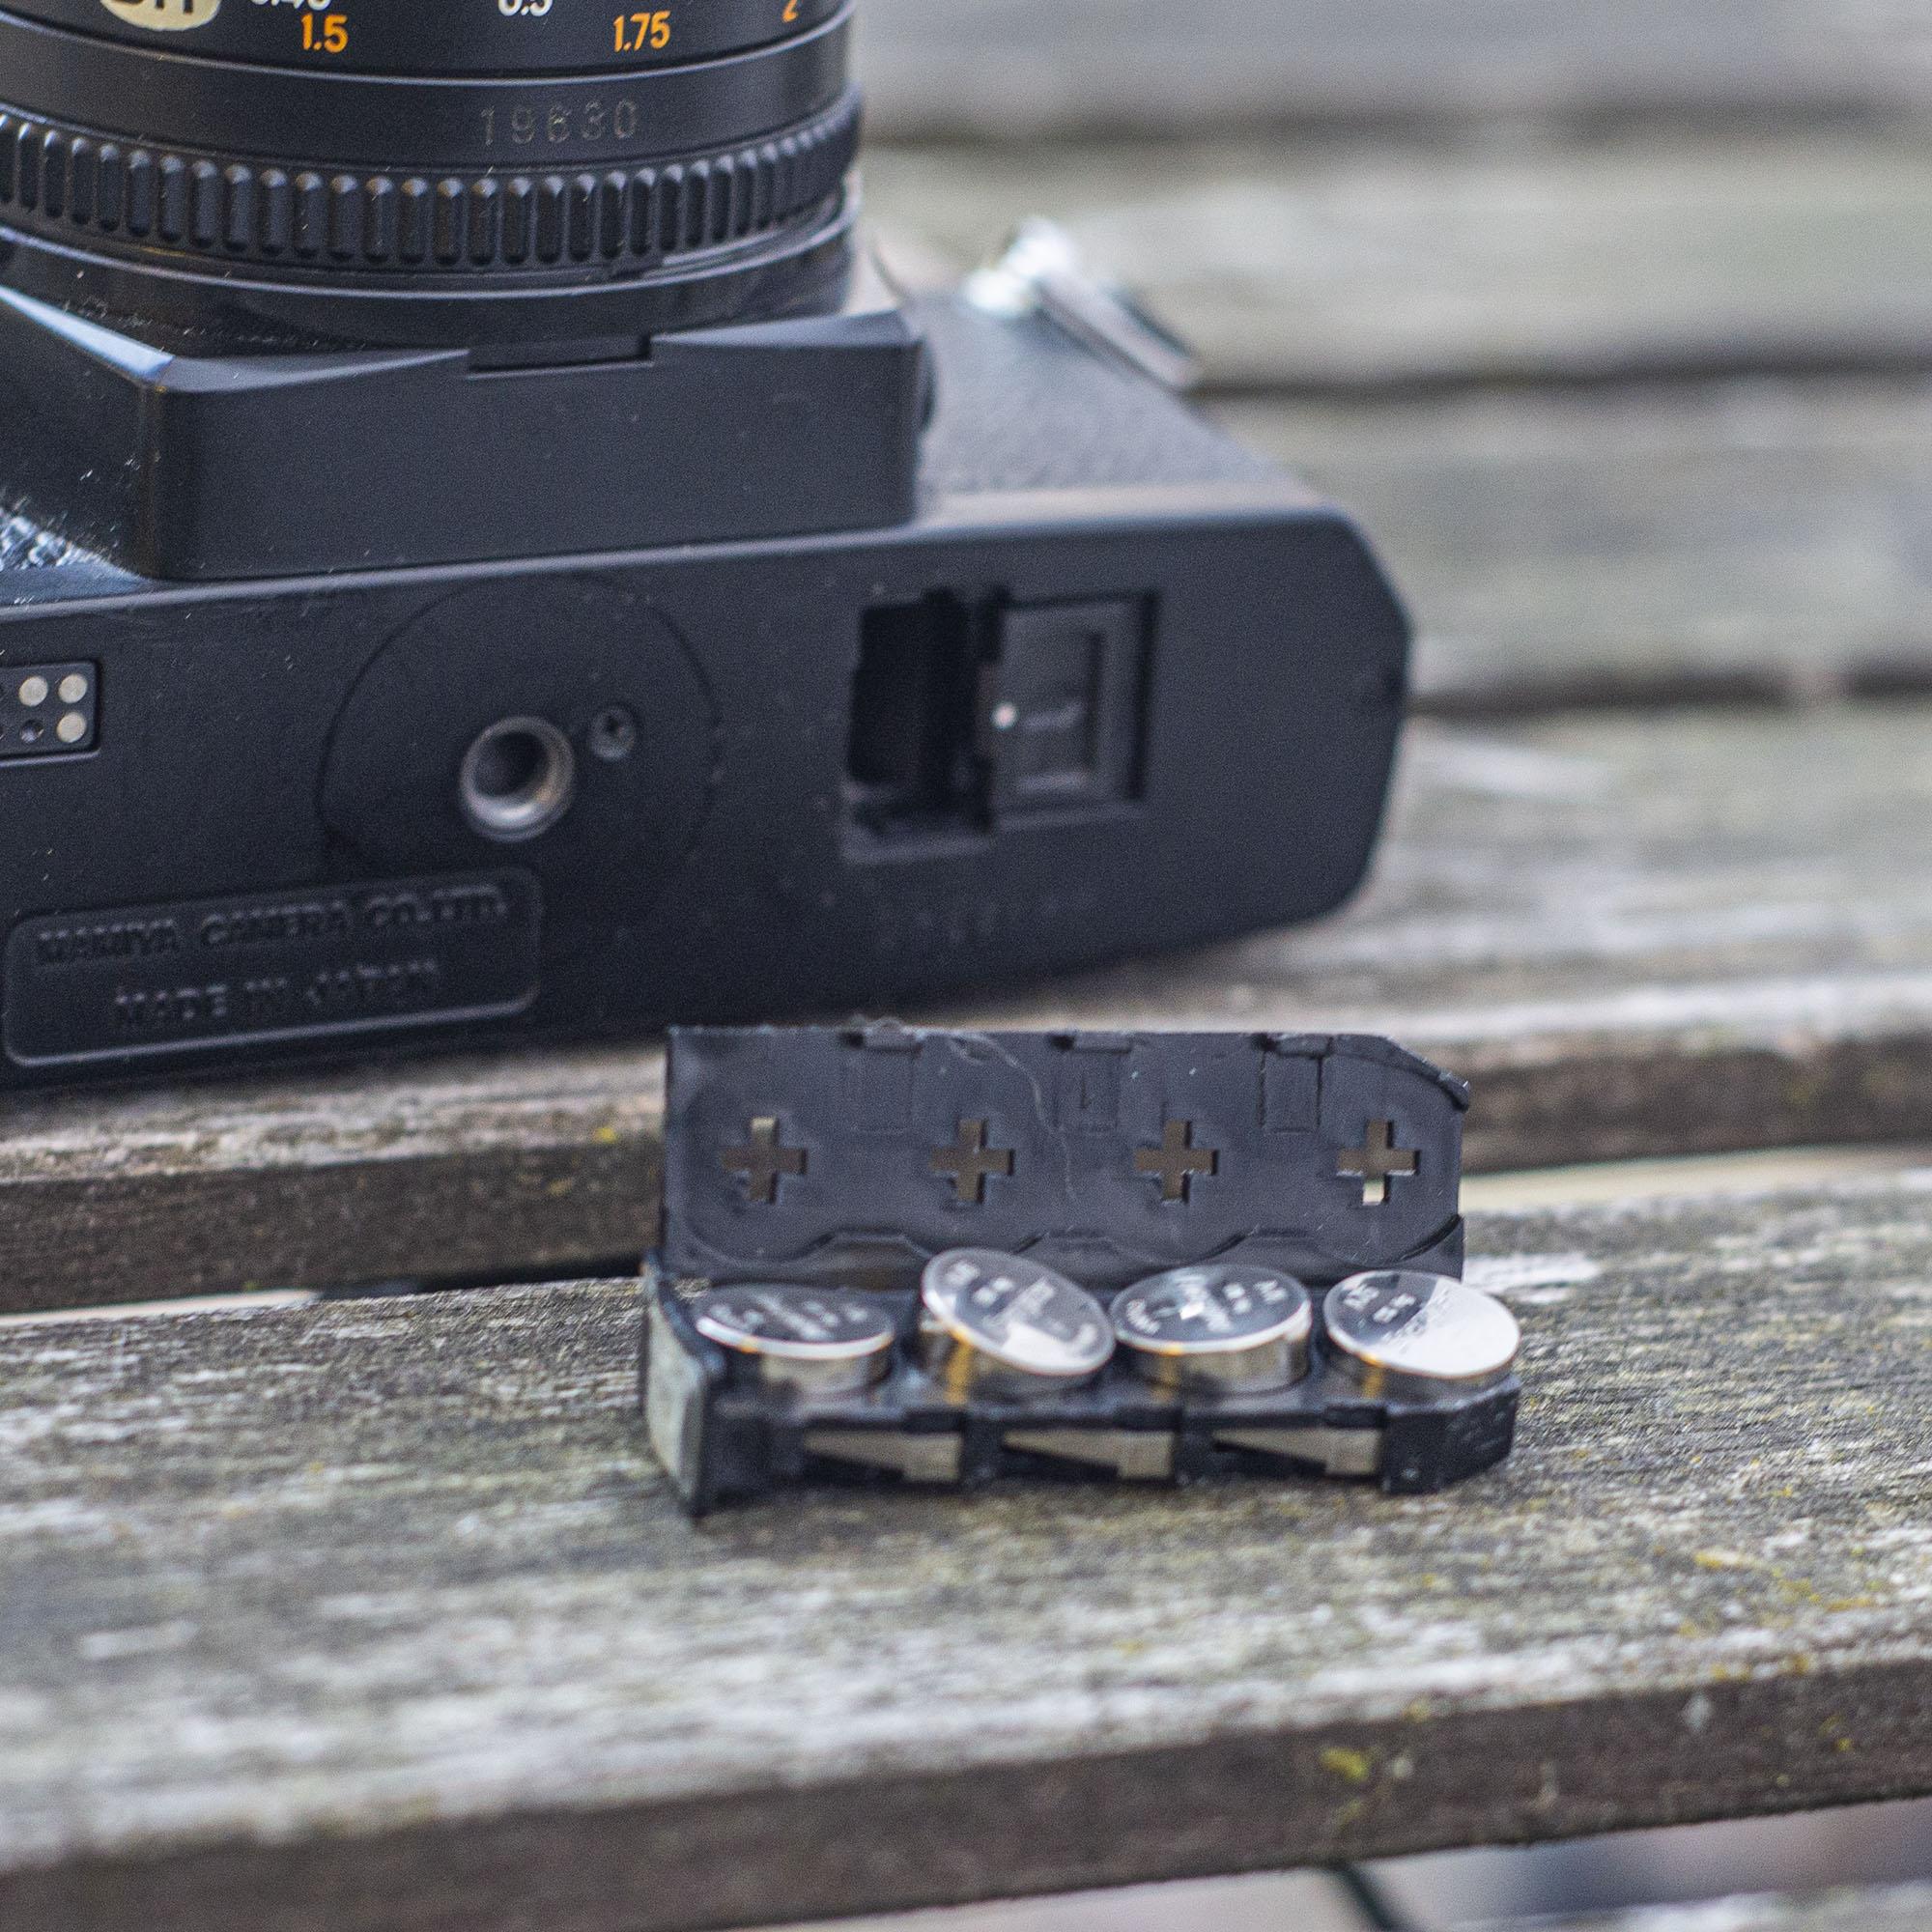 Mamiya ZE-2 battery tray